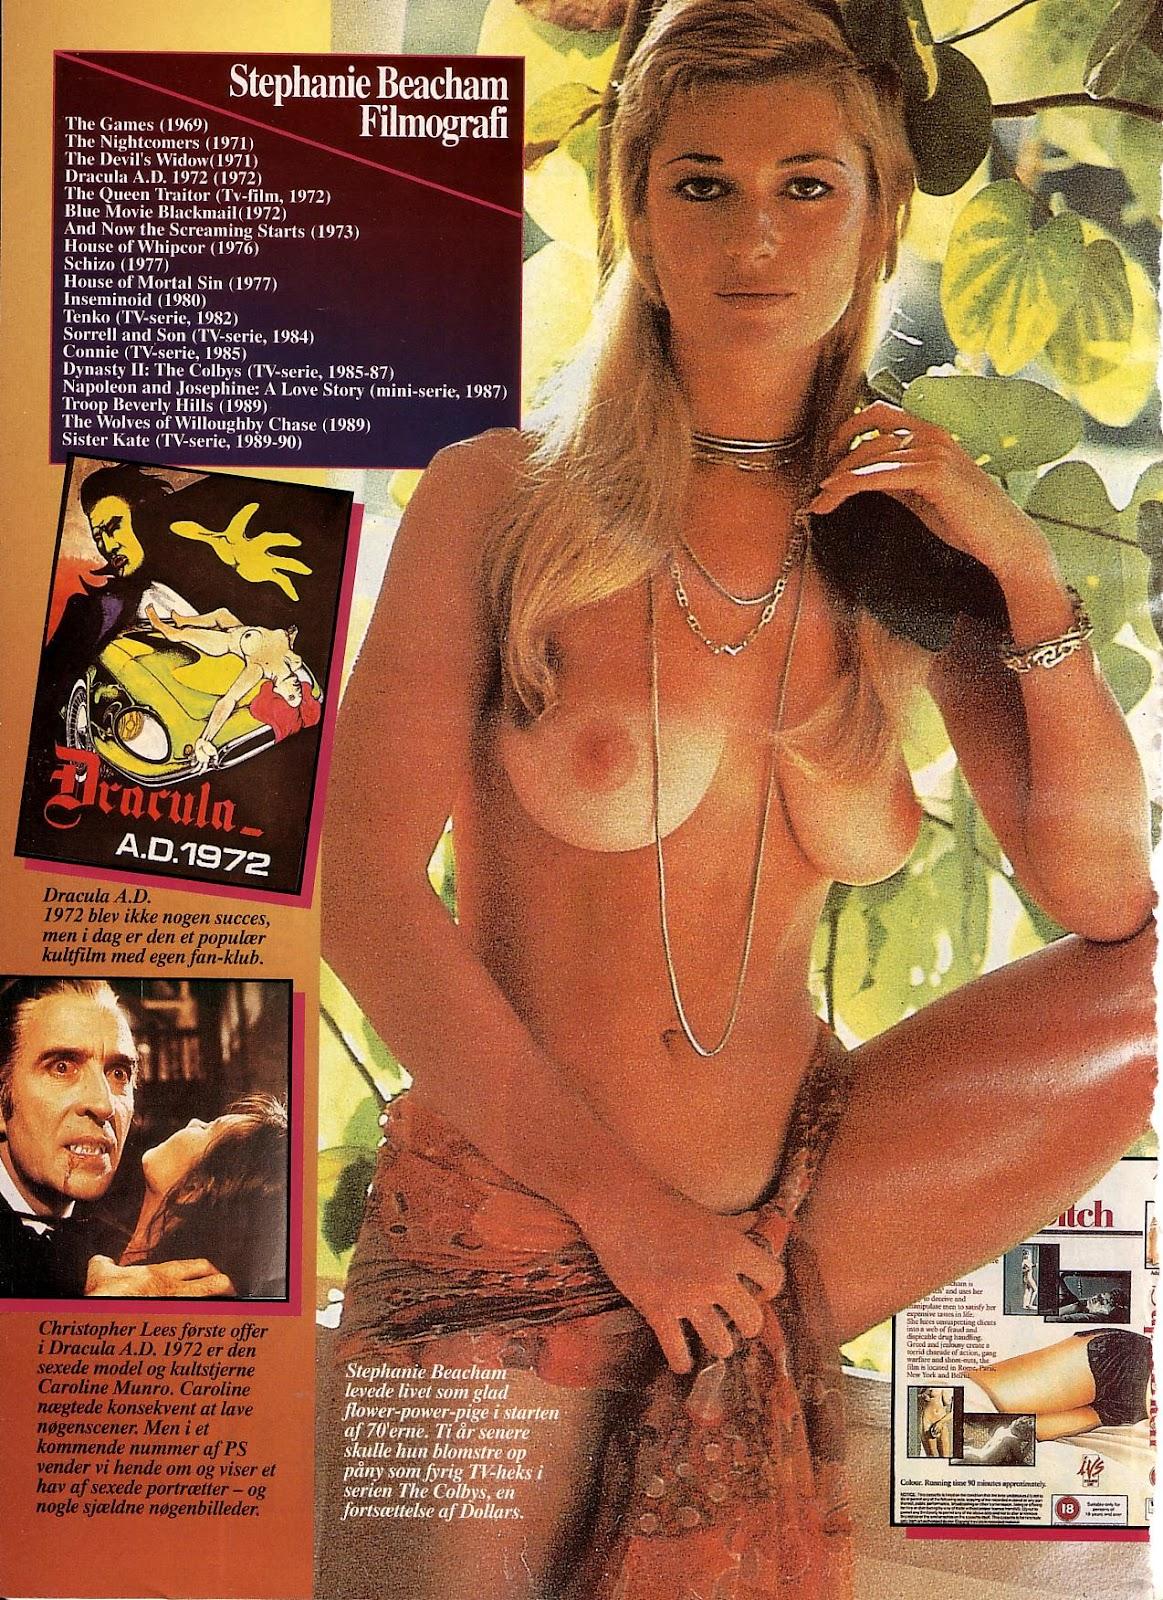 Young stephanie beacham nude